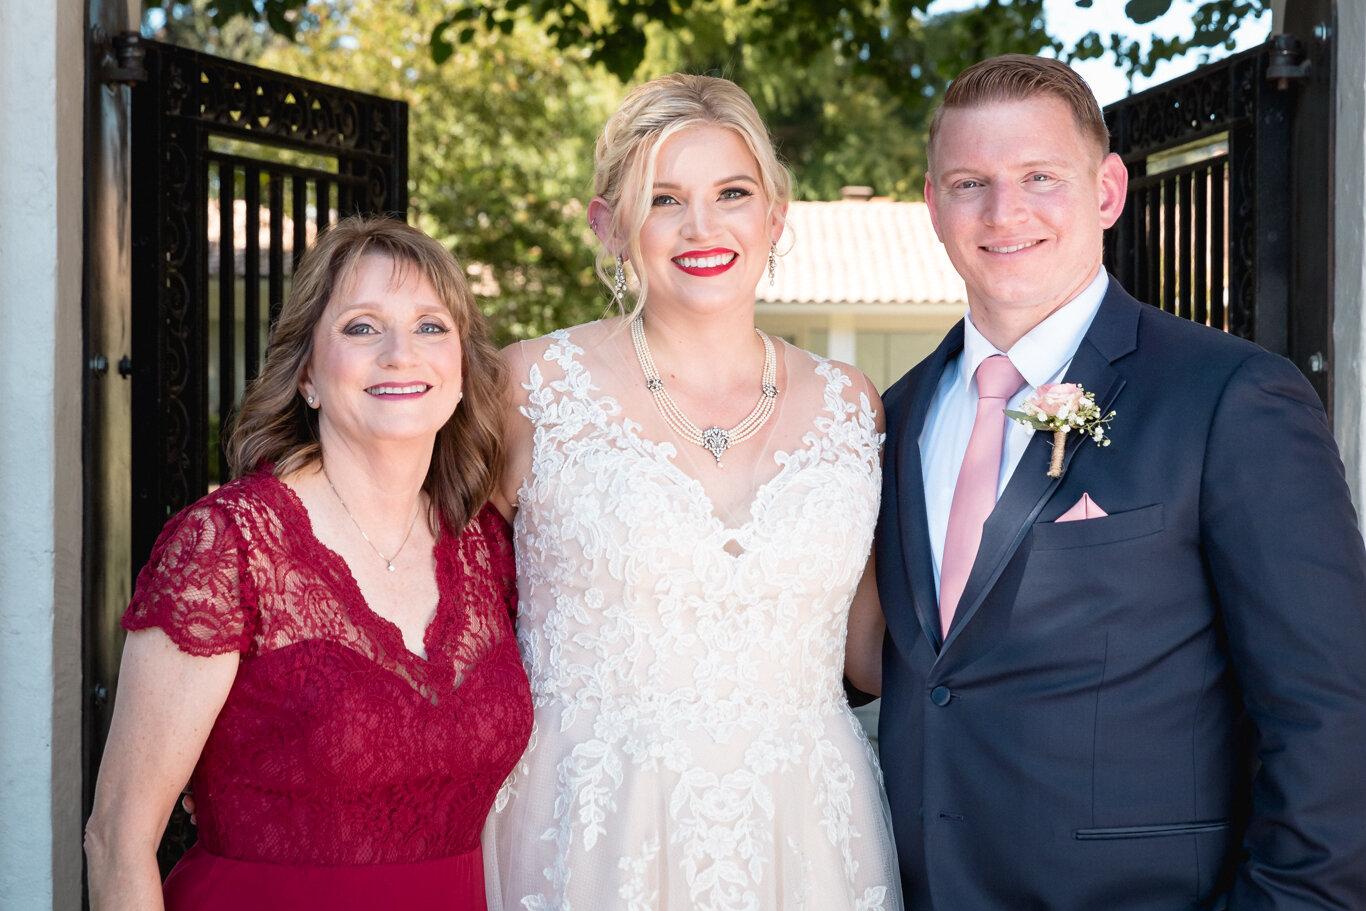 2019.08.24_Emily-Ashir-Wedding-at-the-Maples-5505.jpg